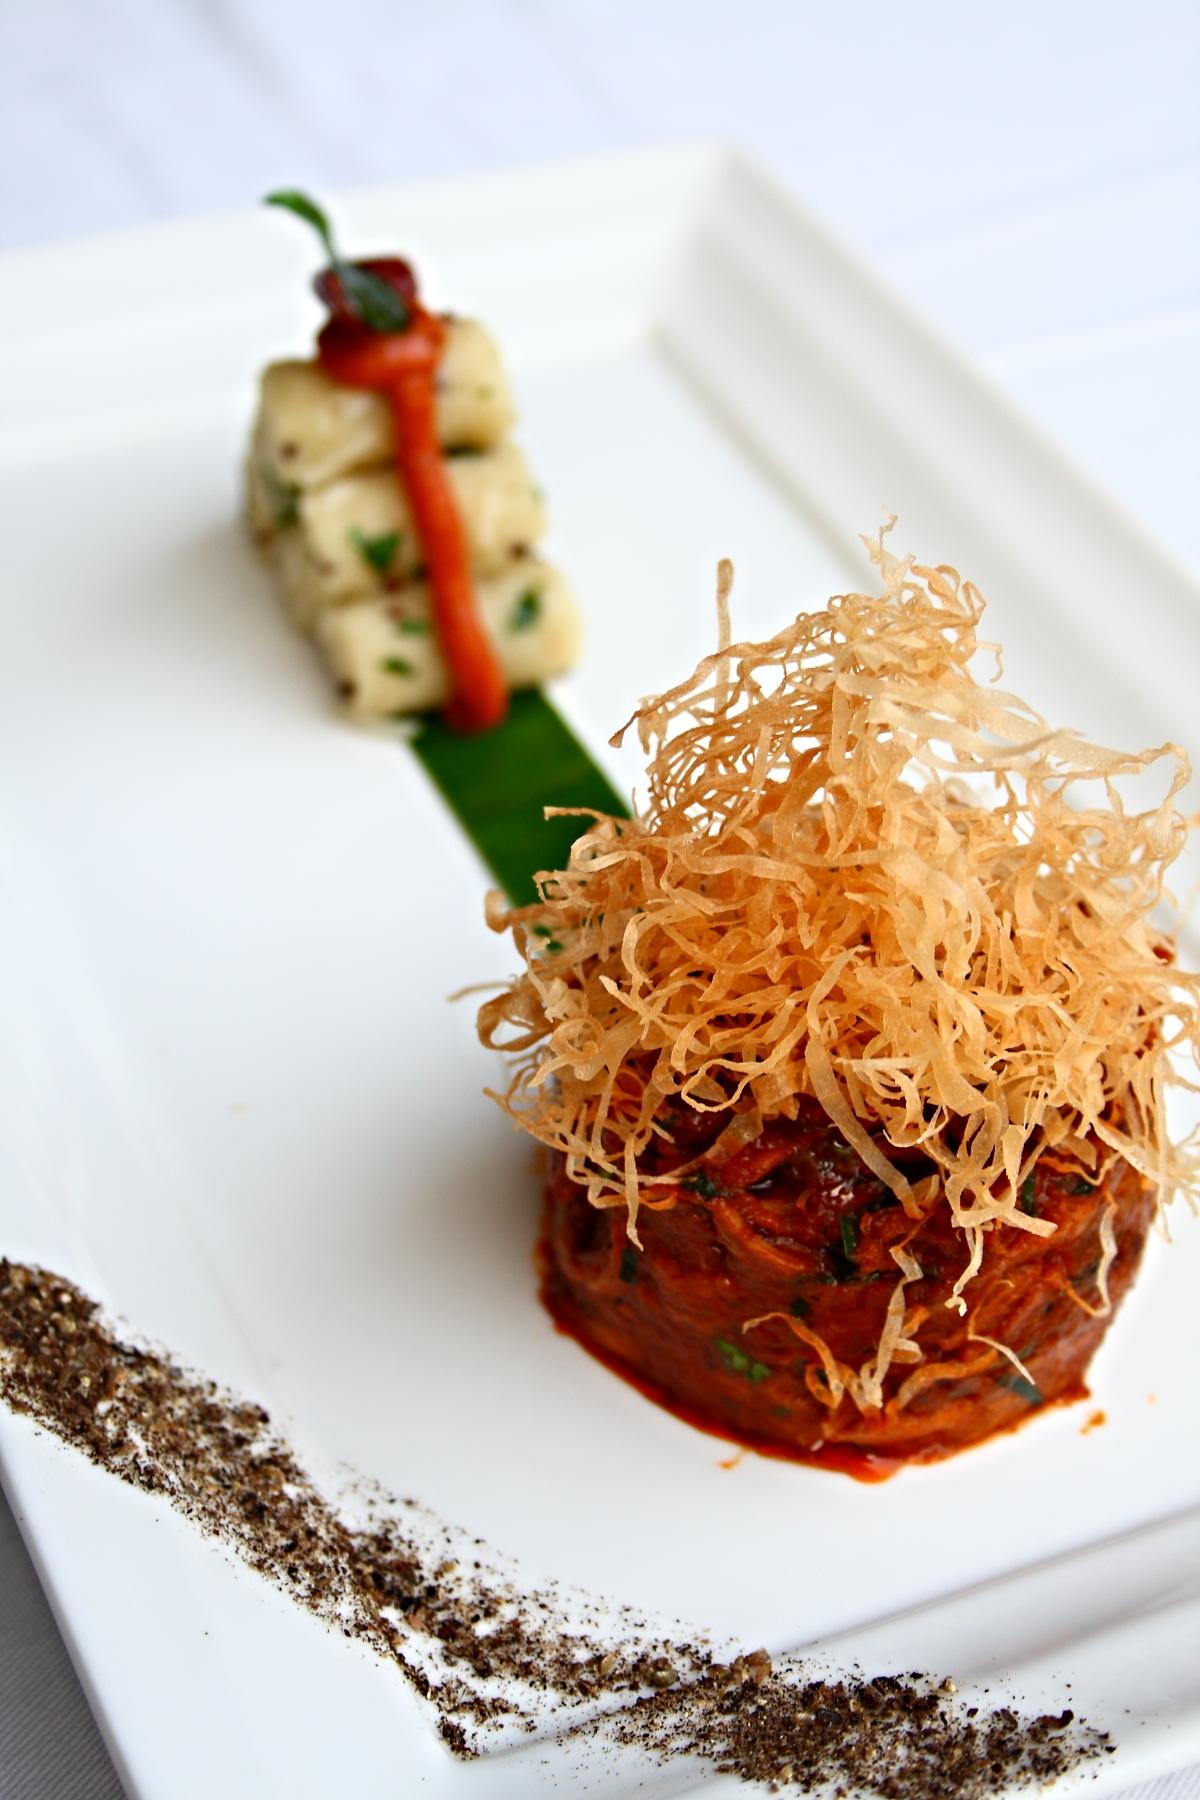 Duck Chettinad, Upma Barrels, Tomato Onion Chutney